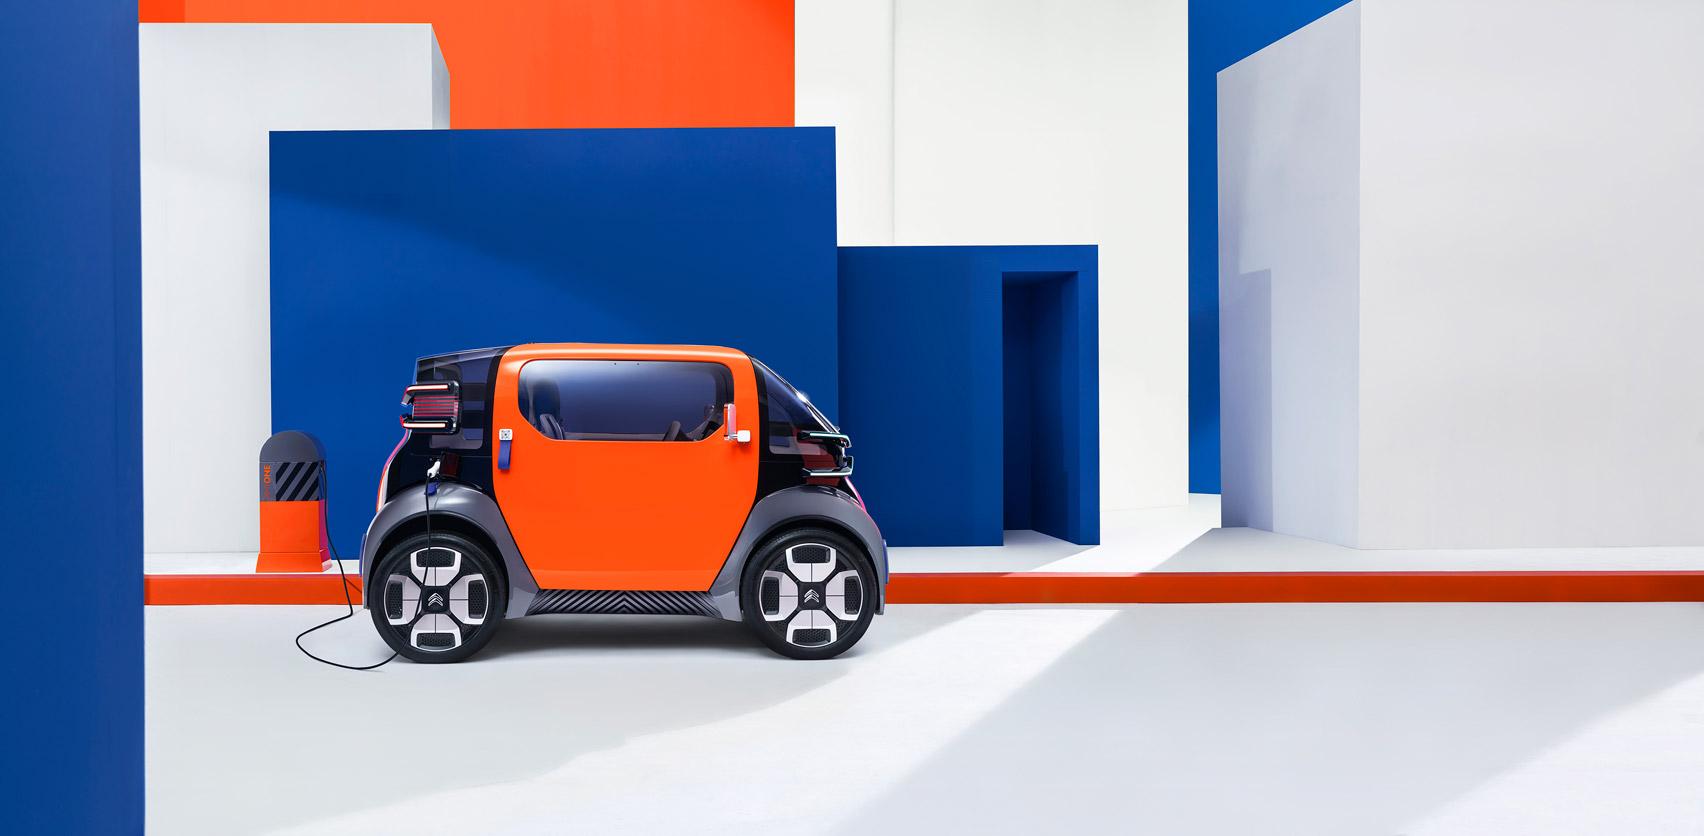 Ультракомпактный Citroën для тех, у кого нет прав